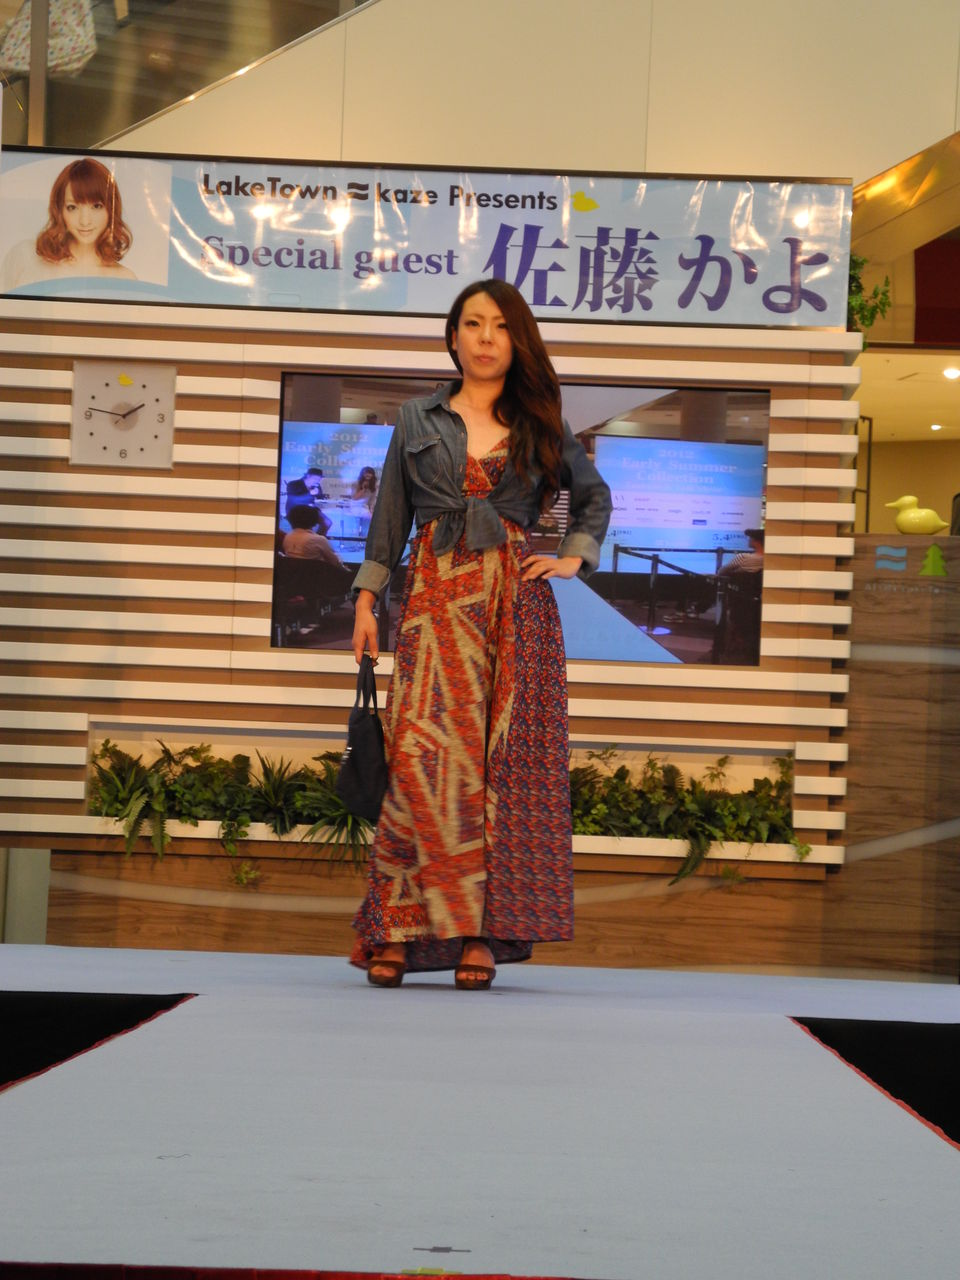 120504kazeファッションショー ネクスト+(+(ブログ可)2